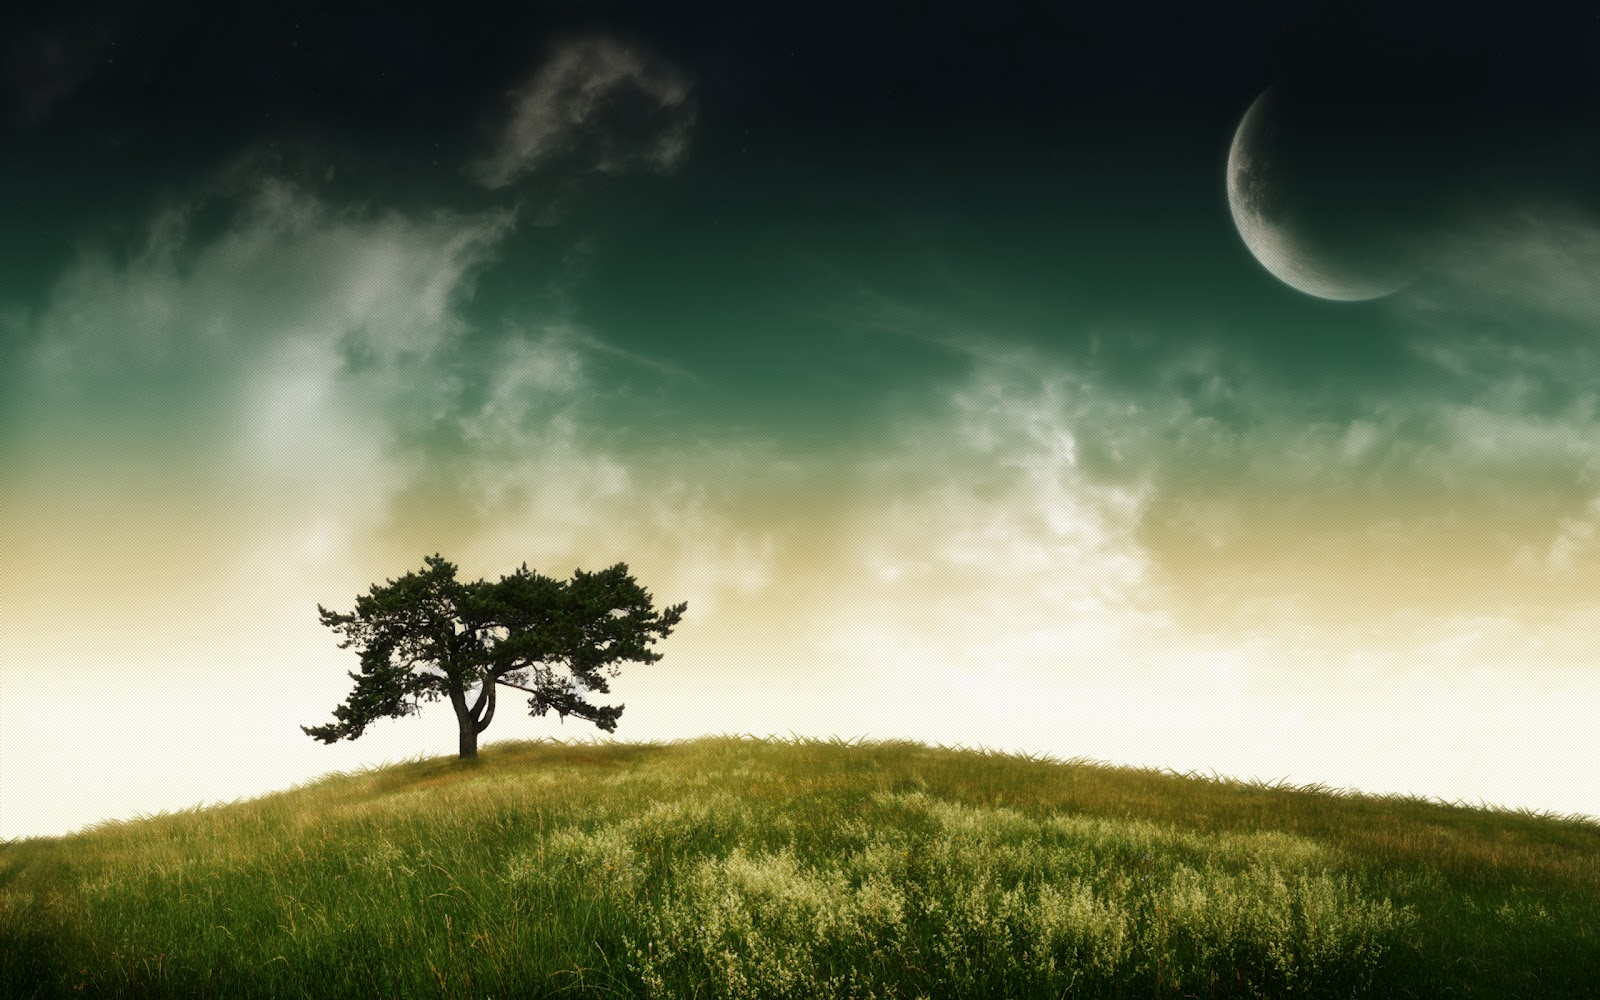 tree desktop background - photo #39